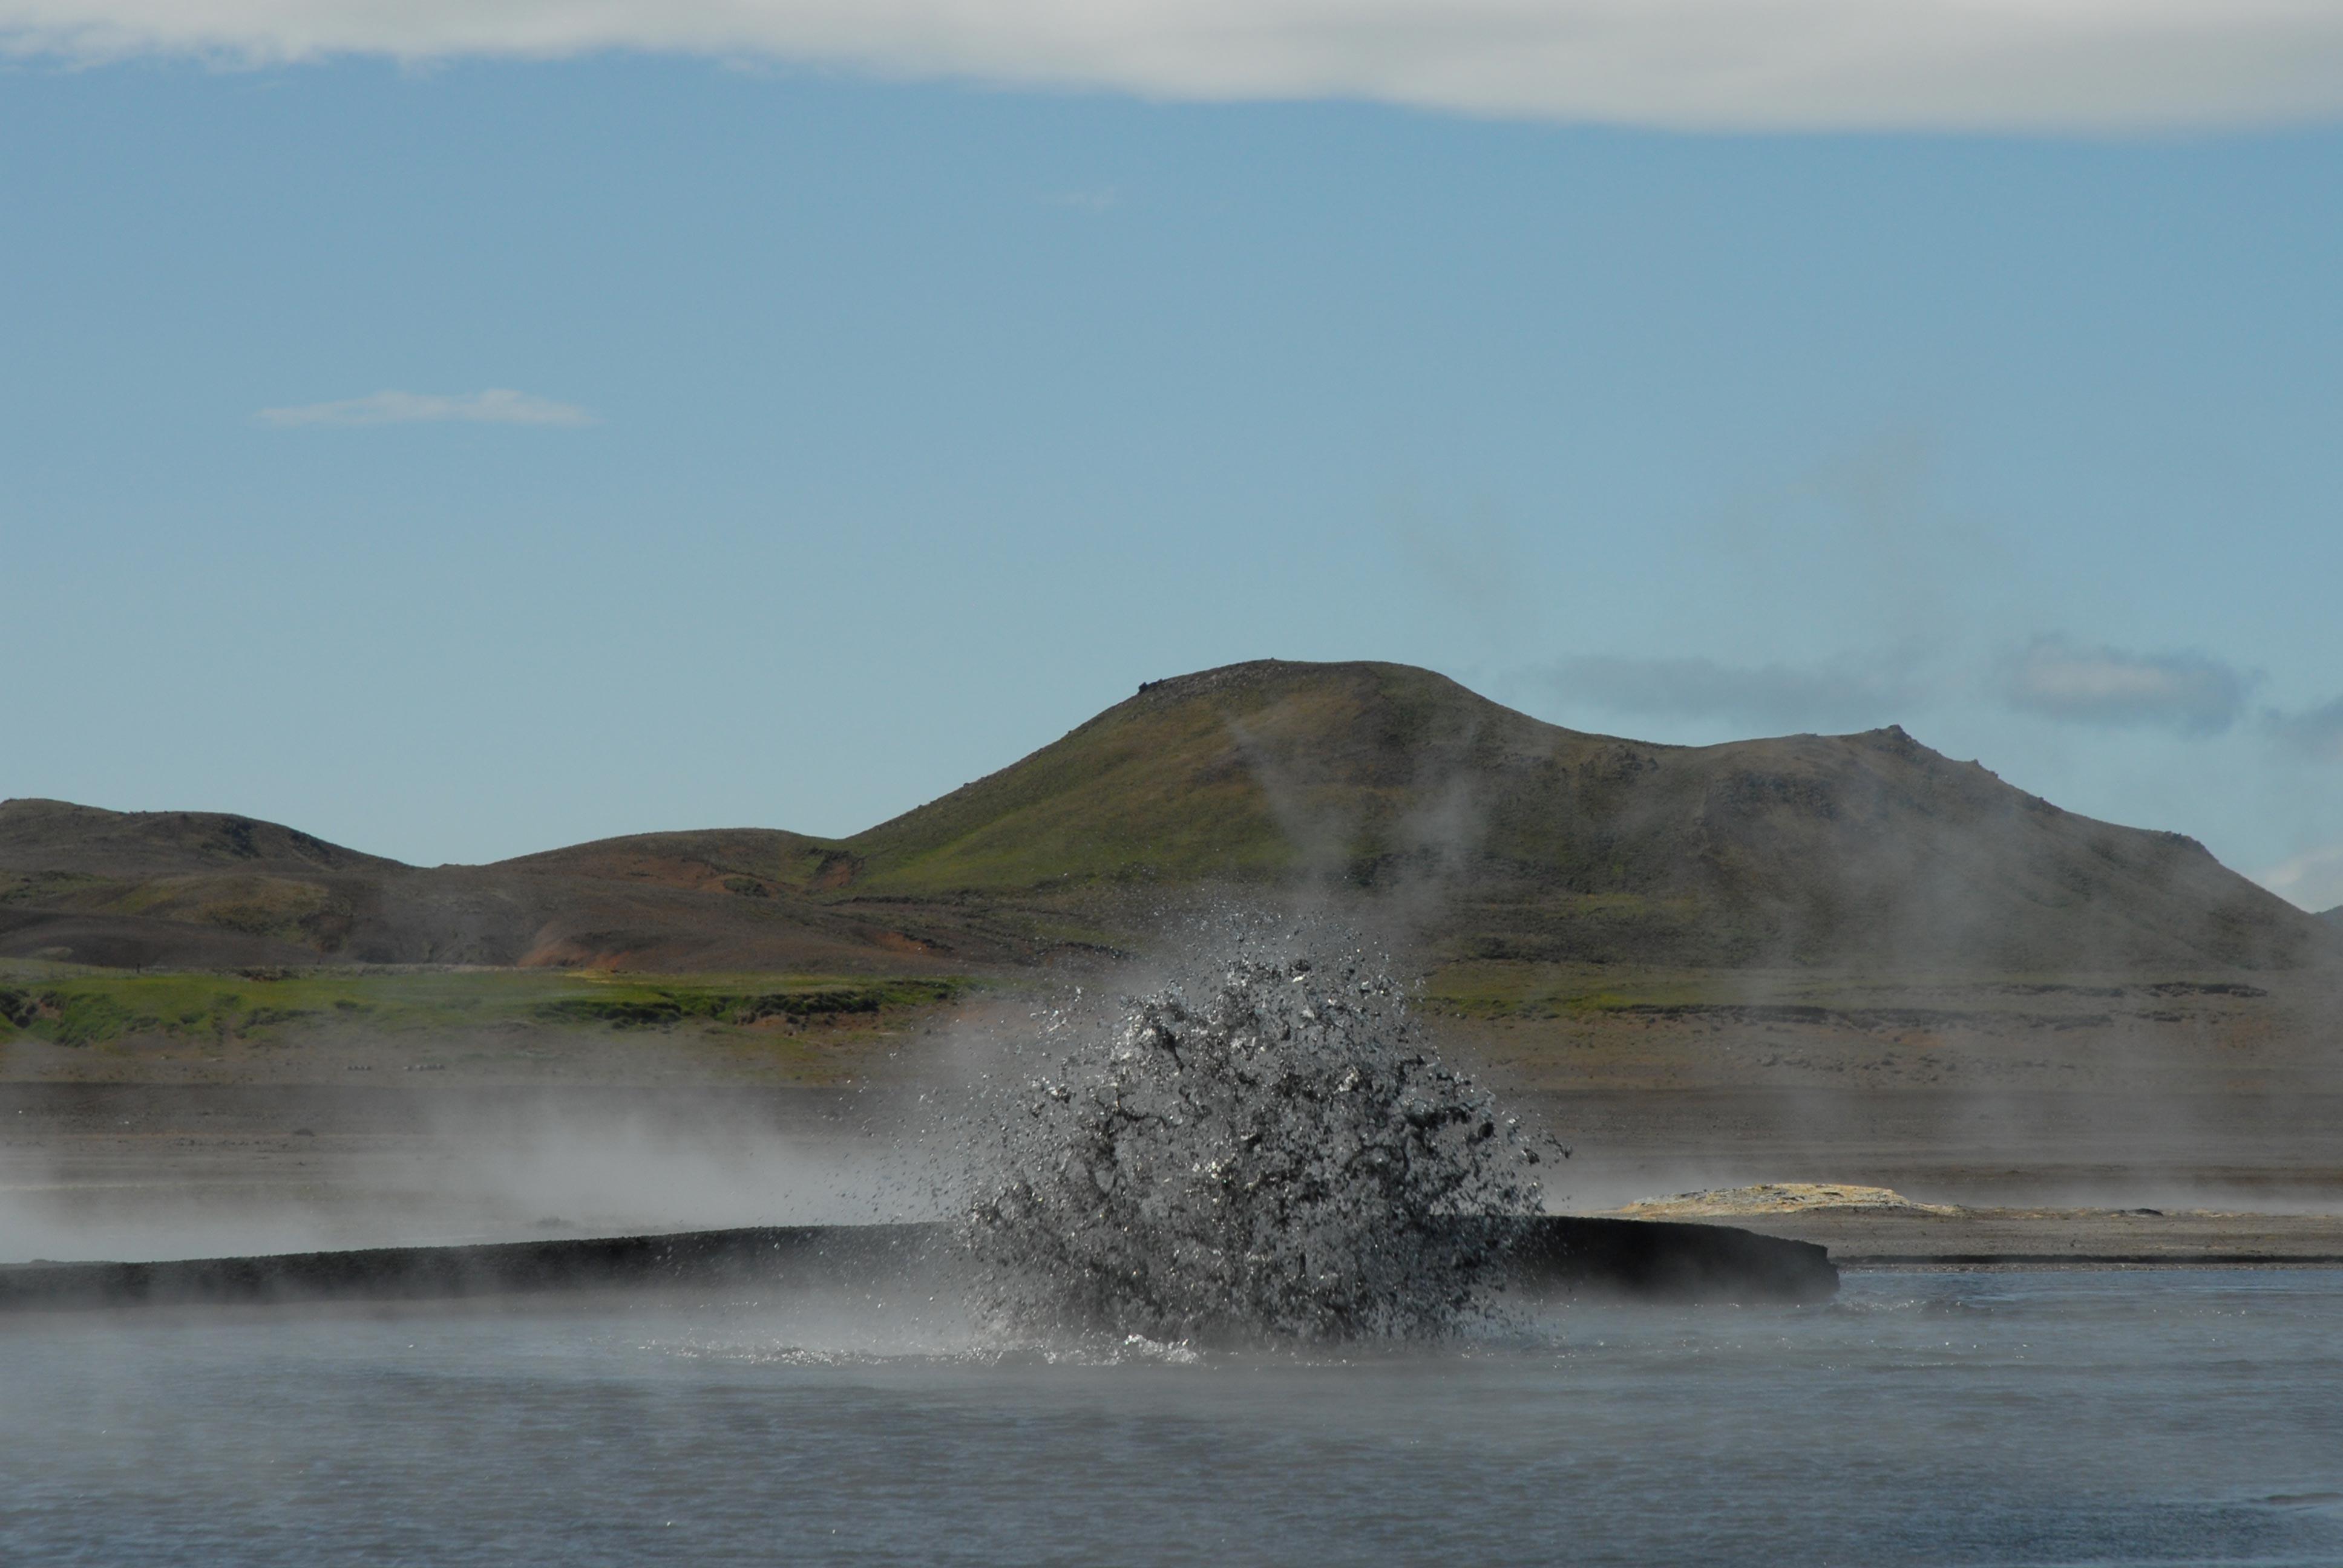 Geothermie Keflavatan Island, Islande eruption Keflavatan